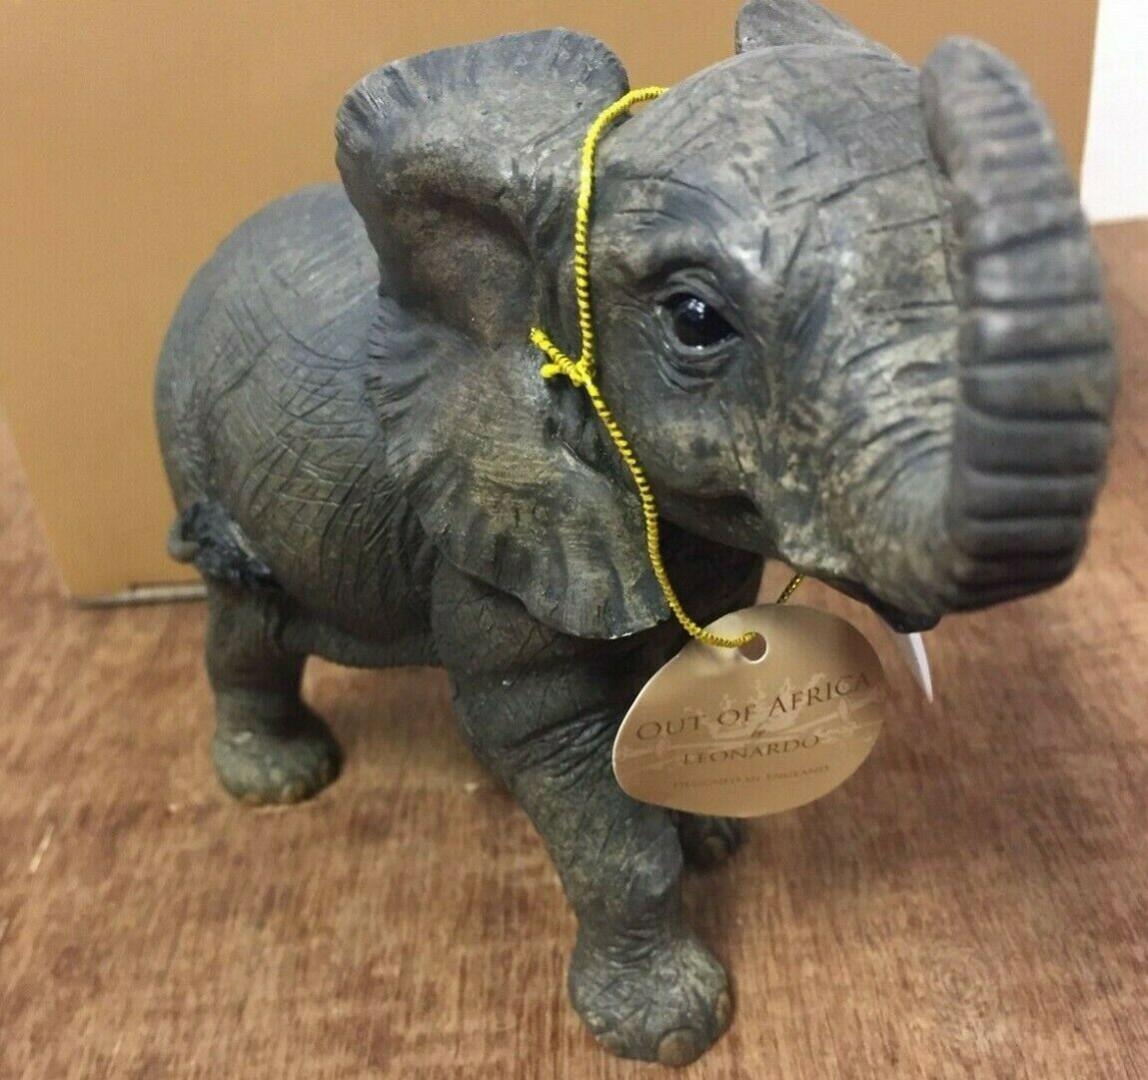 African Elephant Mother /& Calf Figurine Resin Wild Animal Ornament Gift 13cm